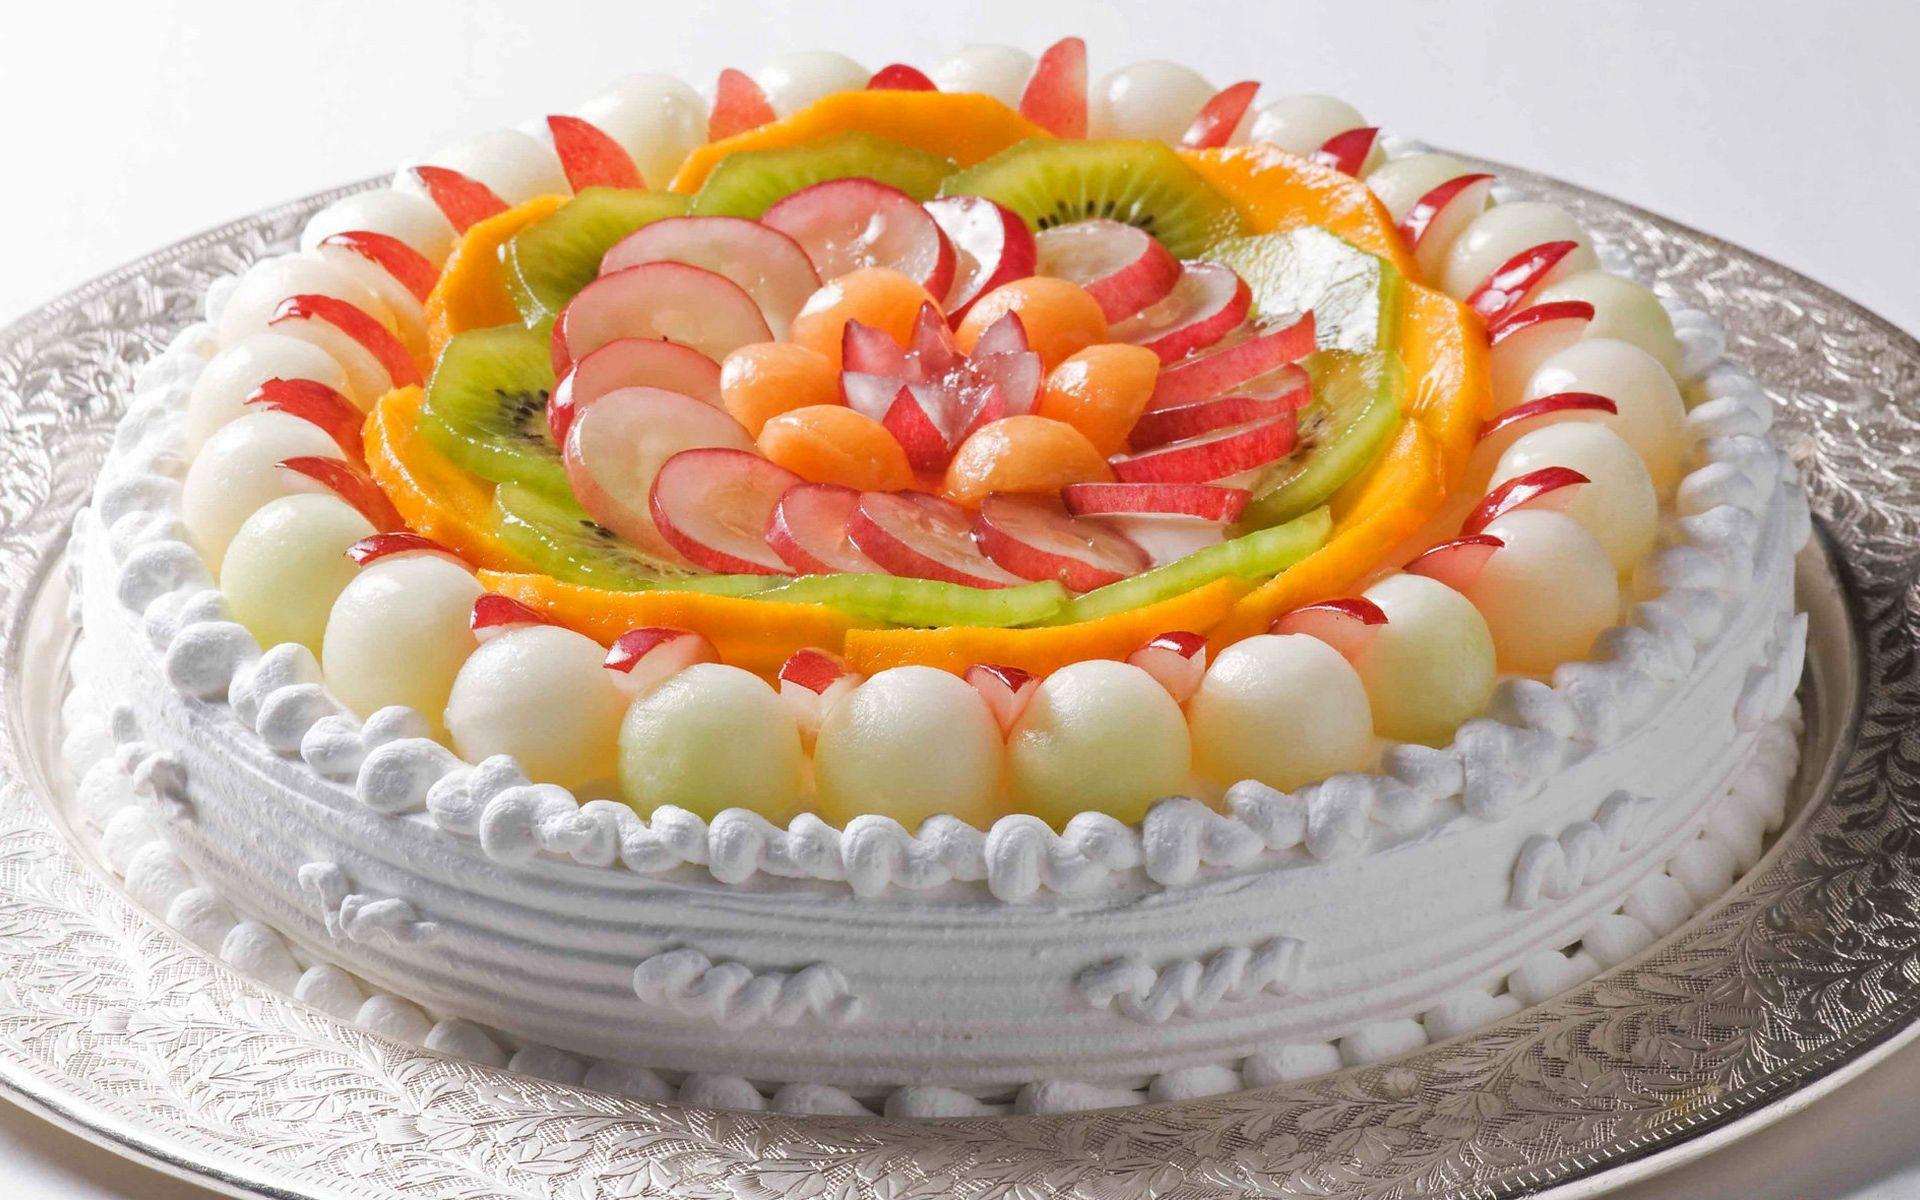 http://3.bp.blogspot.com/-Tl4JydSErLk/UHFYzlBQJVI/AAAAAAAALhI/-vpRXOdWafw/s1920/fruits_cake-wallpaper.jpg